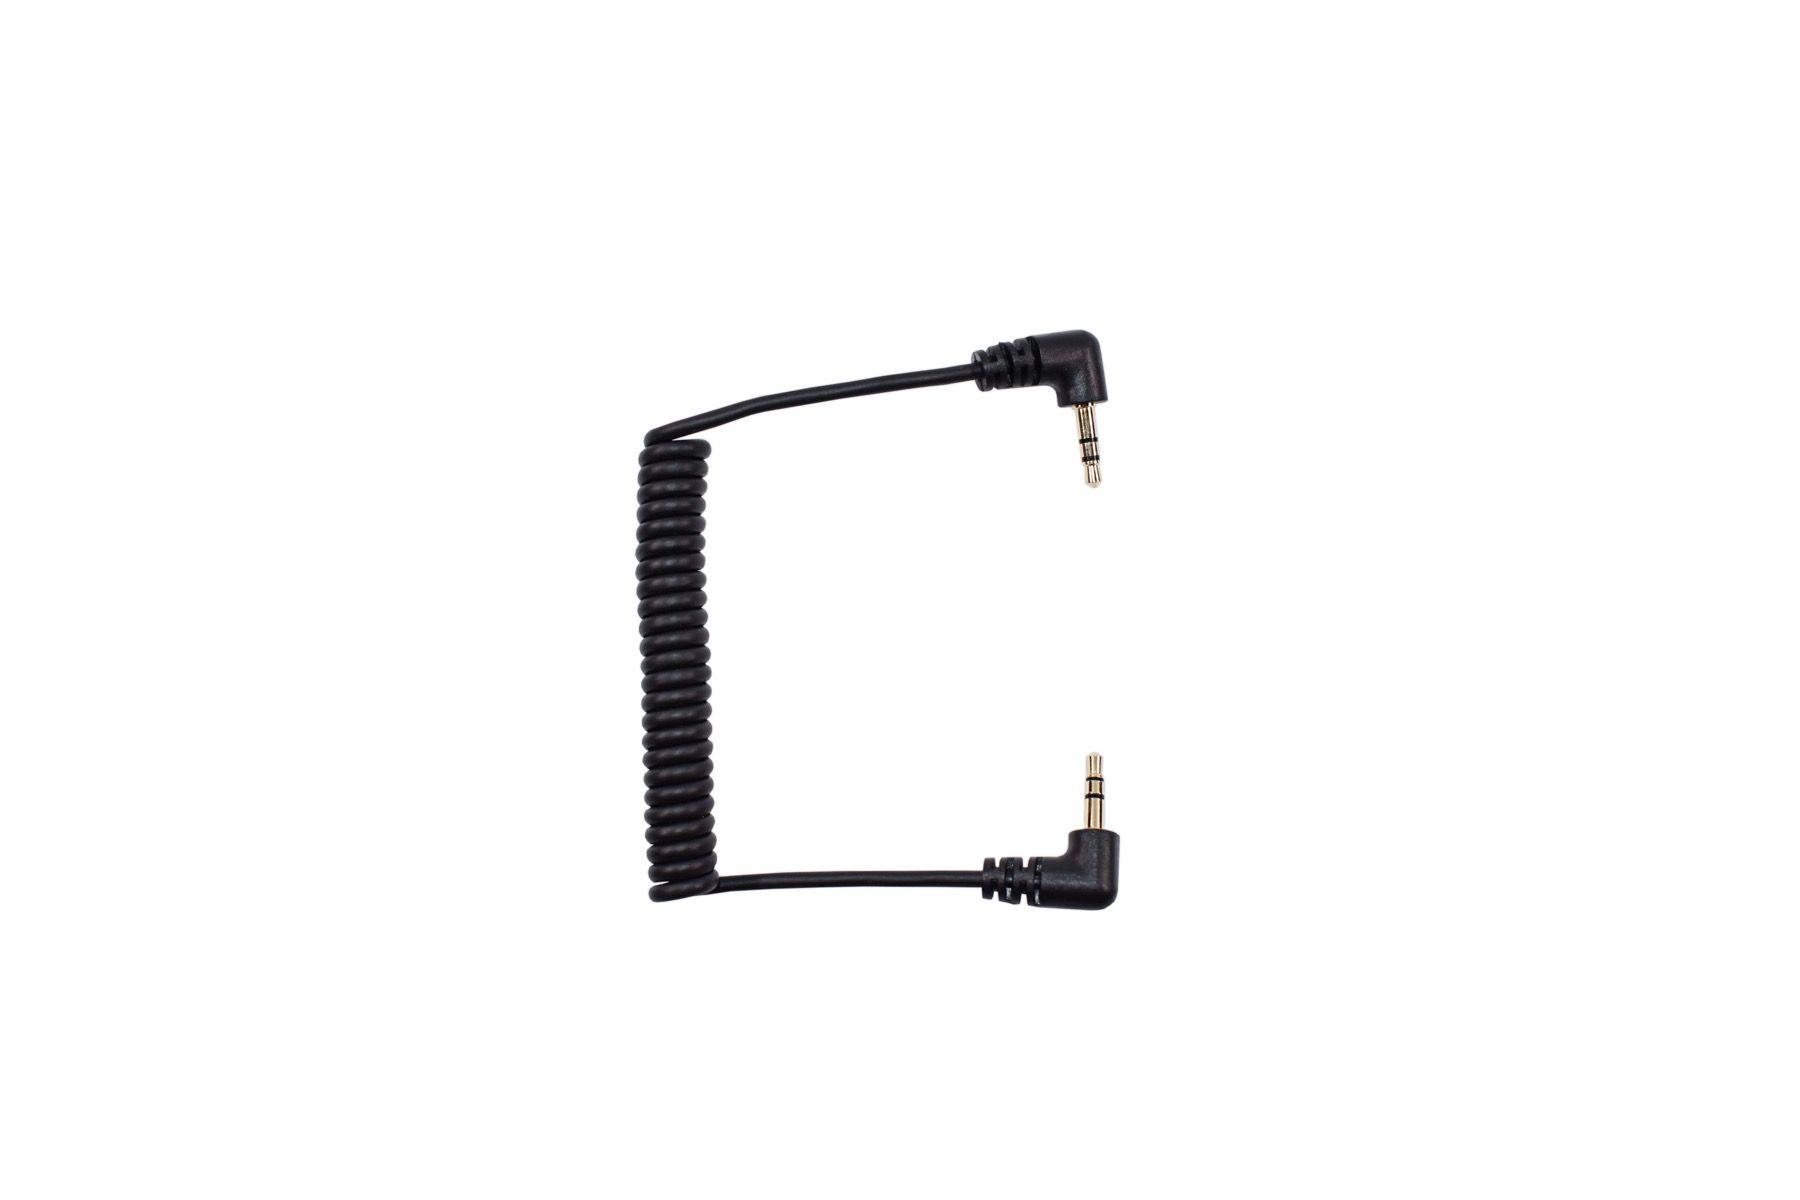 CKMOVA AC-TTS - kabel 3,5mm TRS - 3,5mm TRS